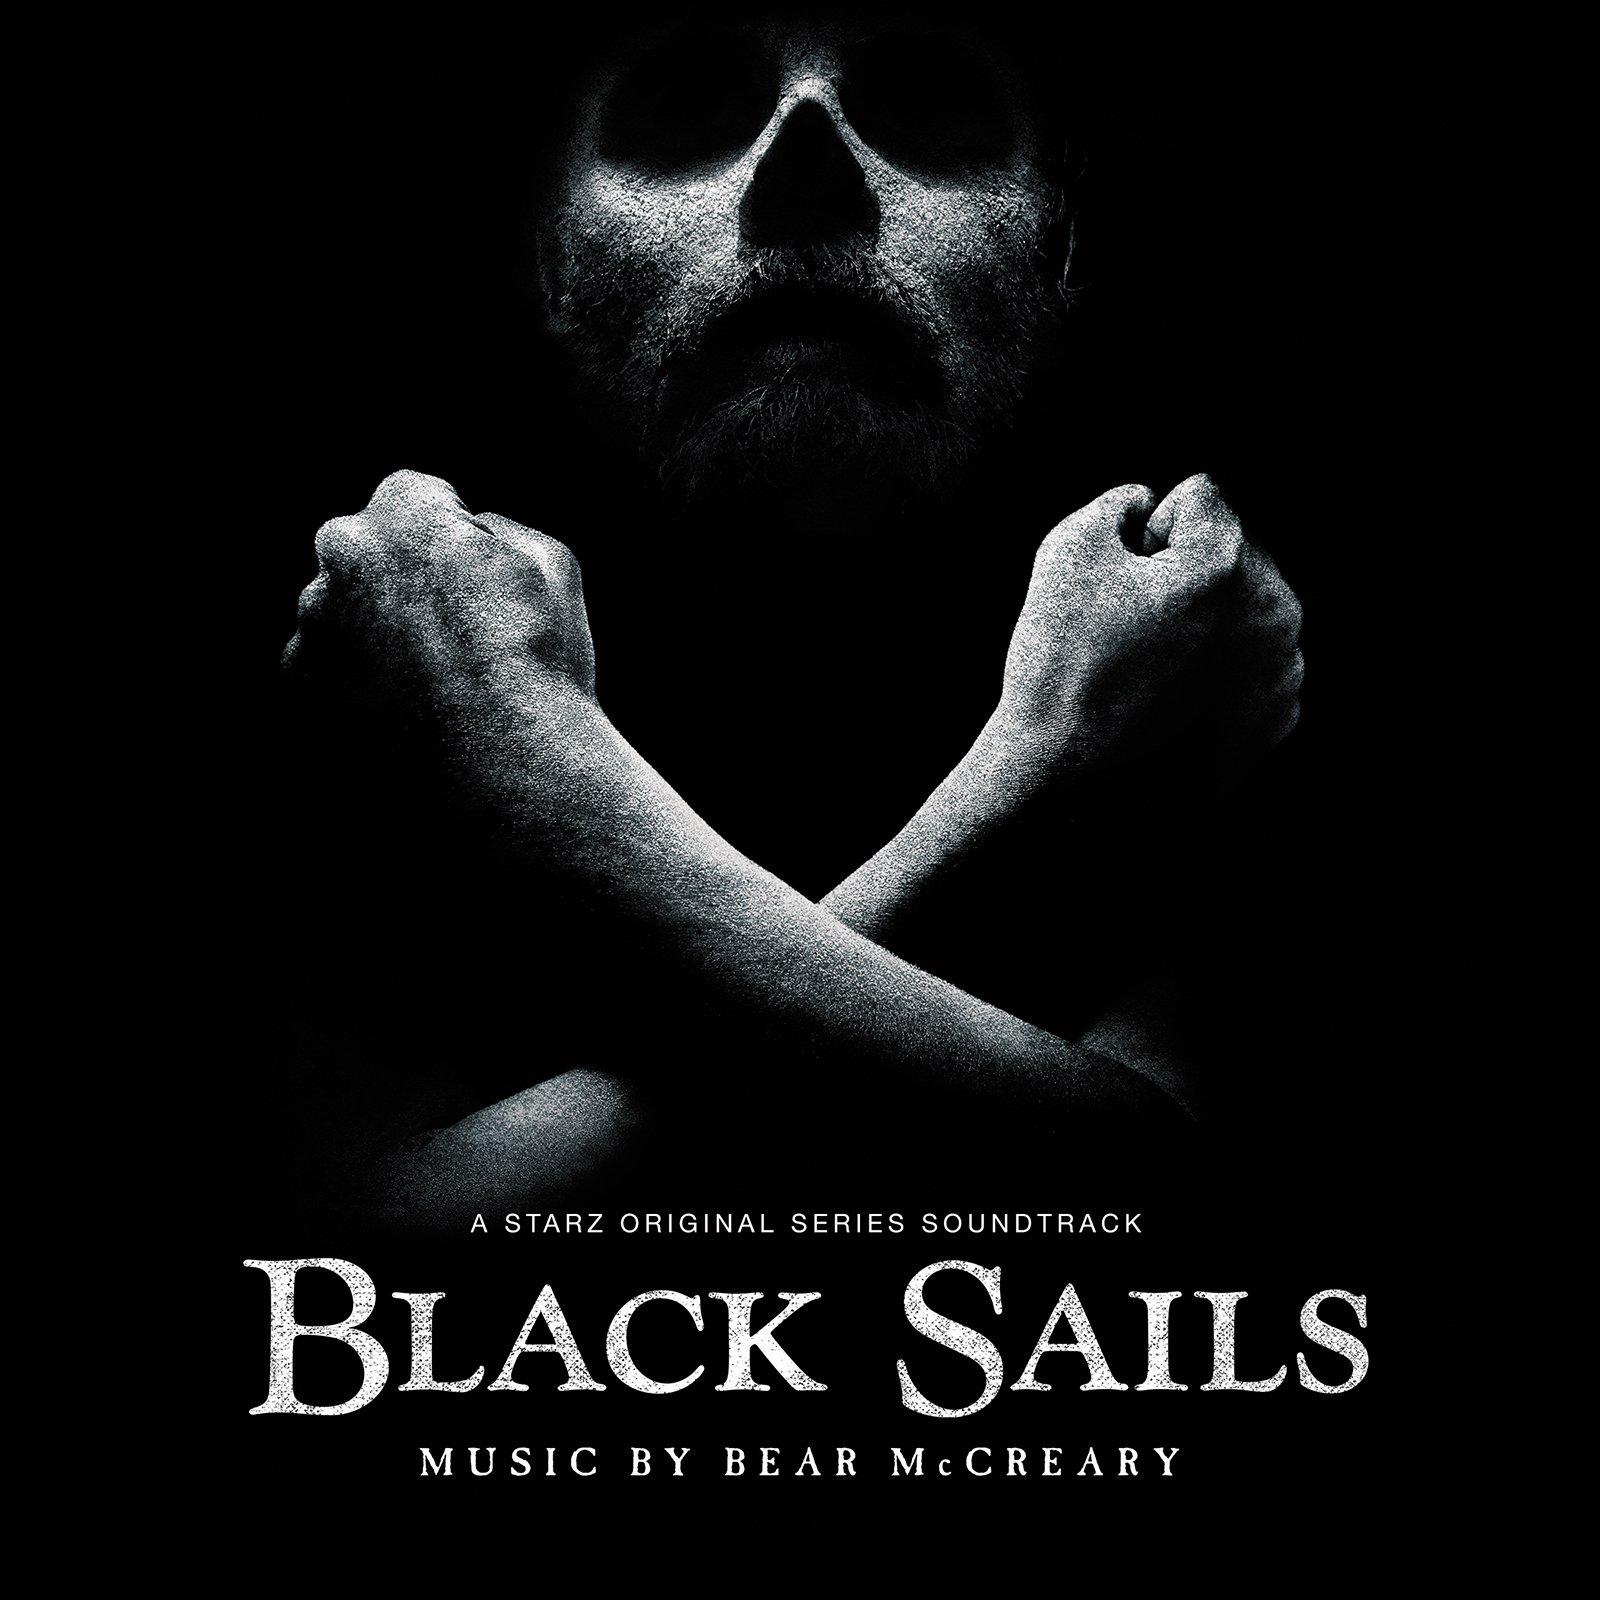 Black Sails (A Starz Original Series Soundtrack)